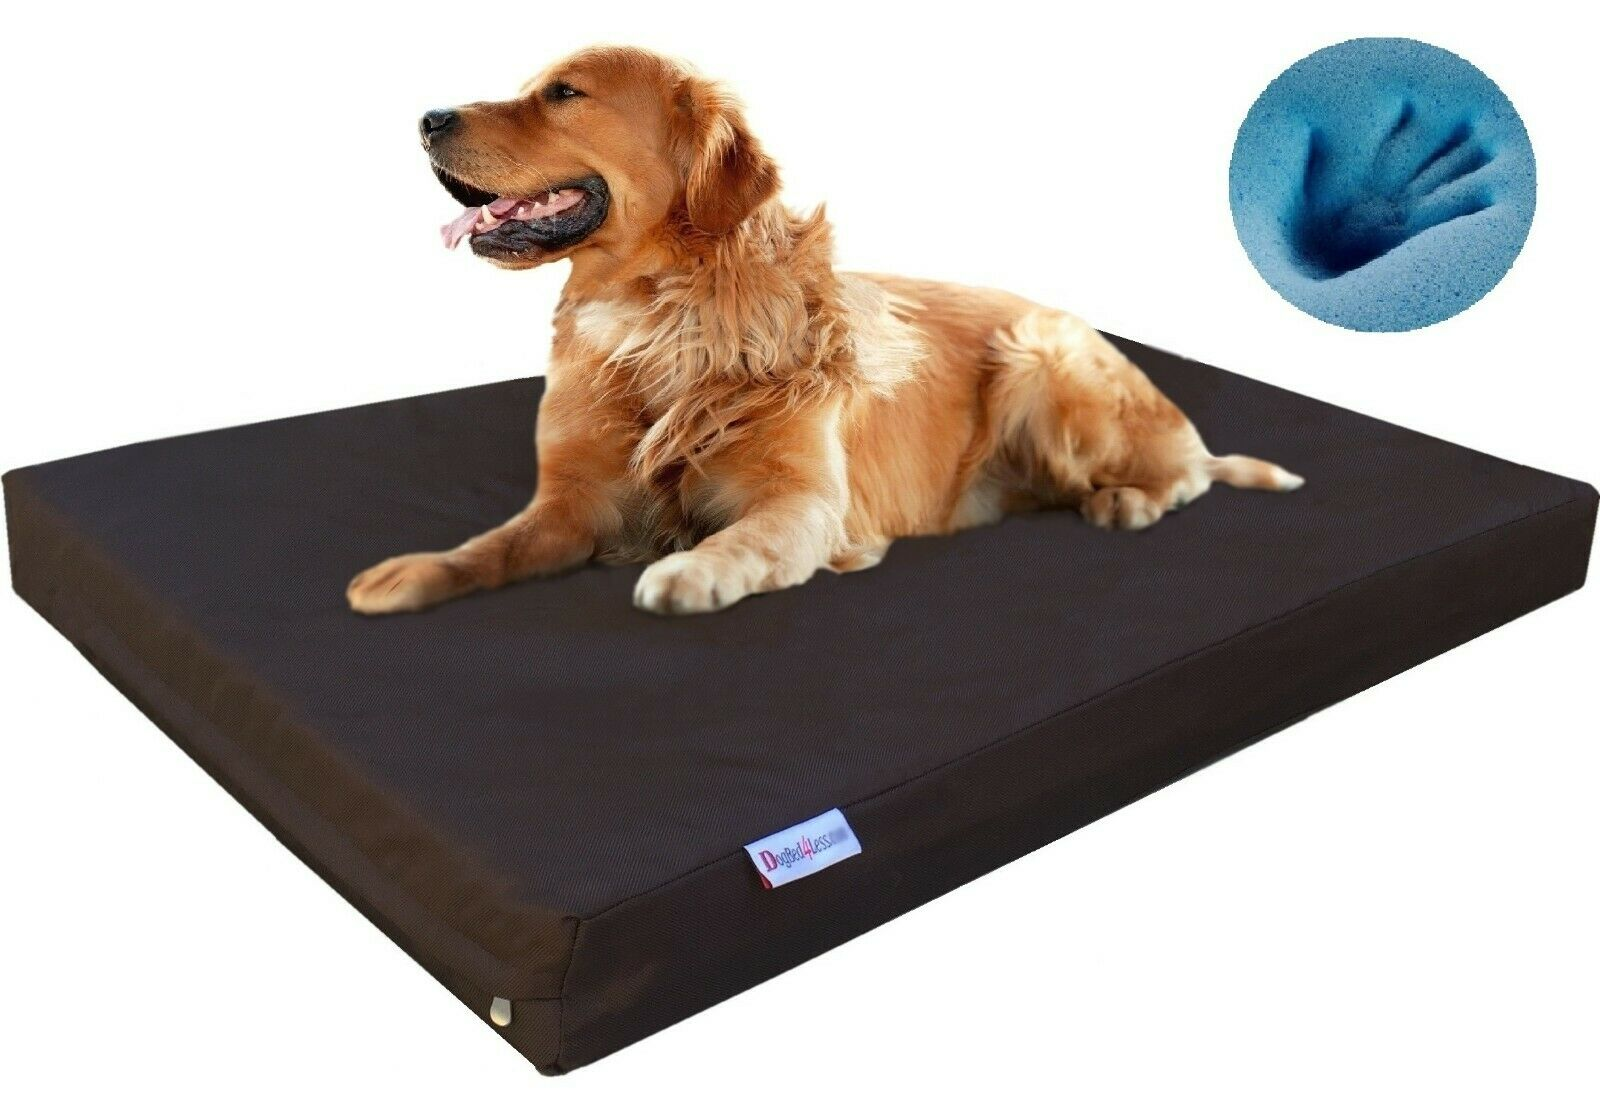 Waterproof XL Large Orthopedic MEMORY FOAM Pet Dog Bed 47 X29 X4  48 X30  Crate